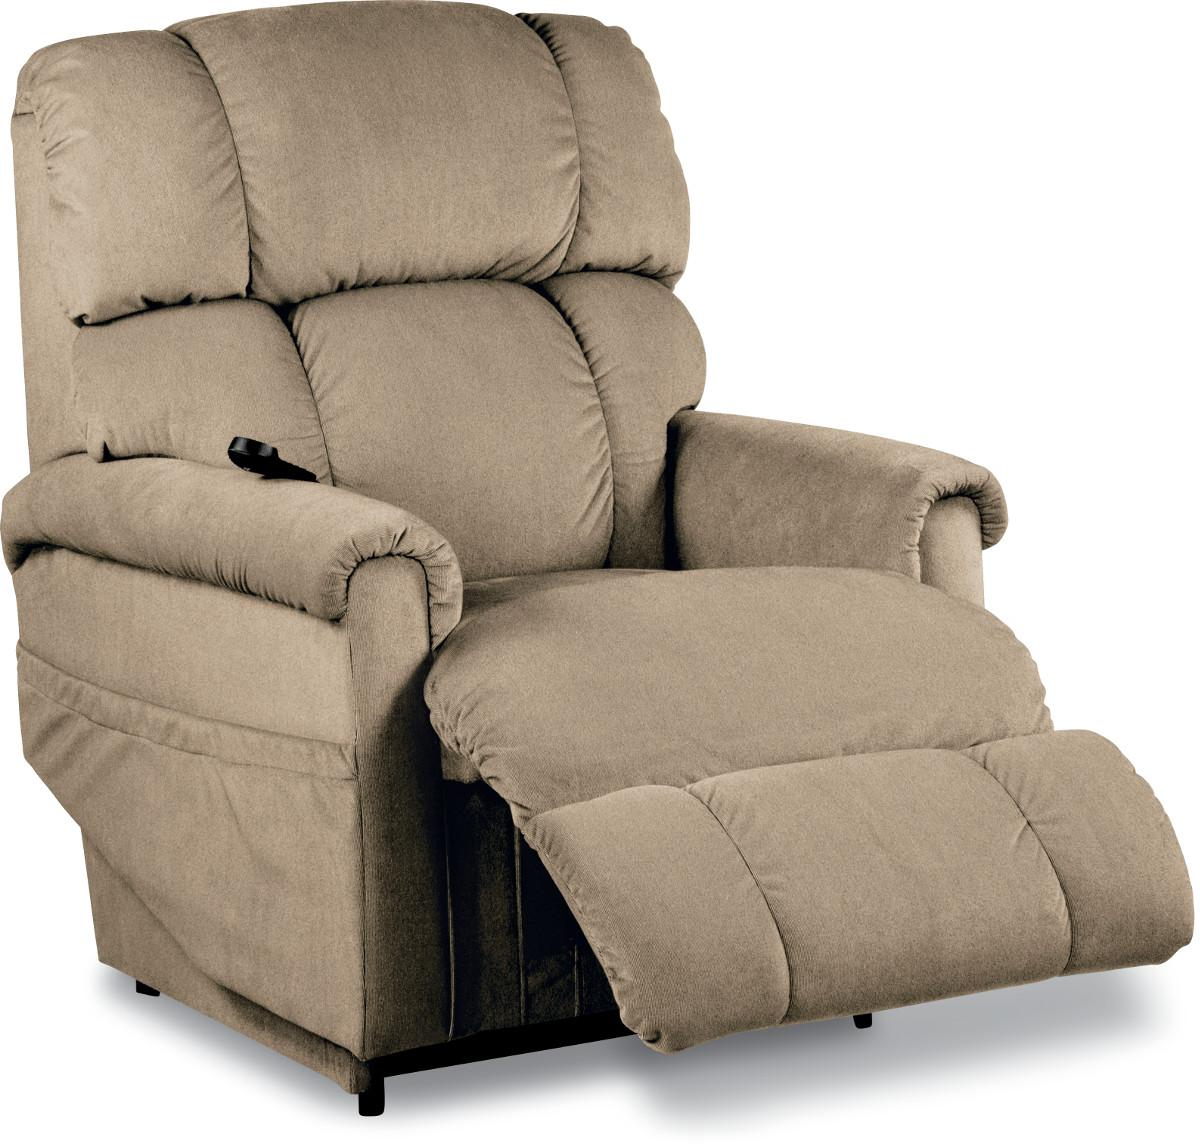 Camo Lift Chair: La-Z-Boy Pinnacle Platinum Luxury Lift® Power-Recline-XR